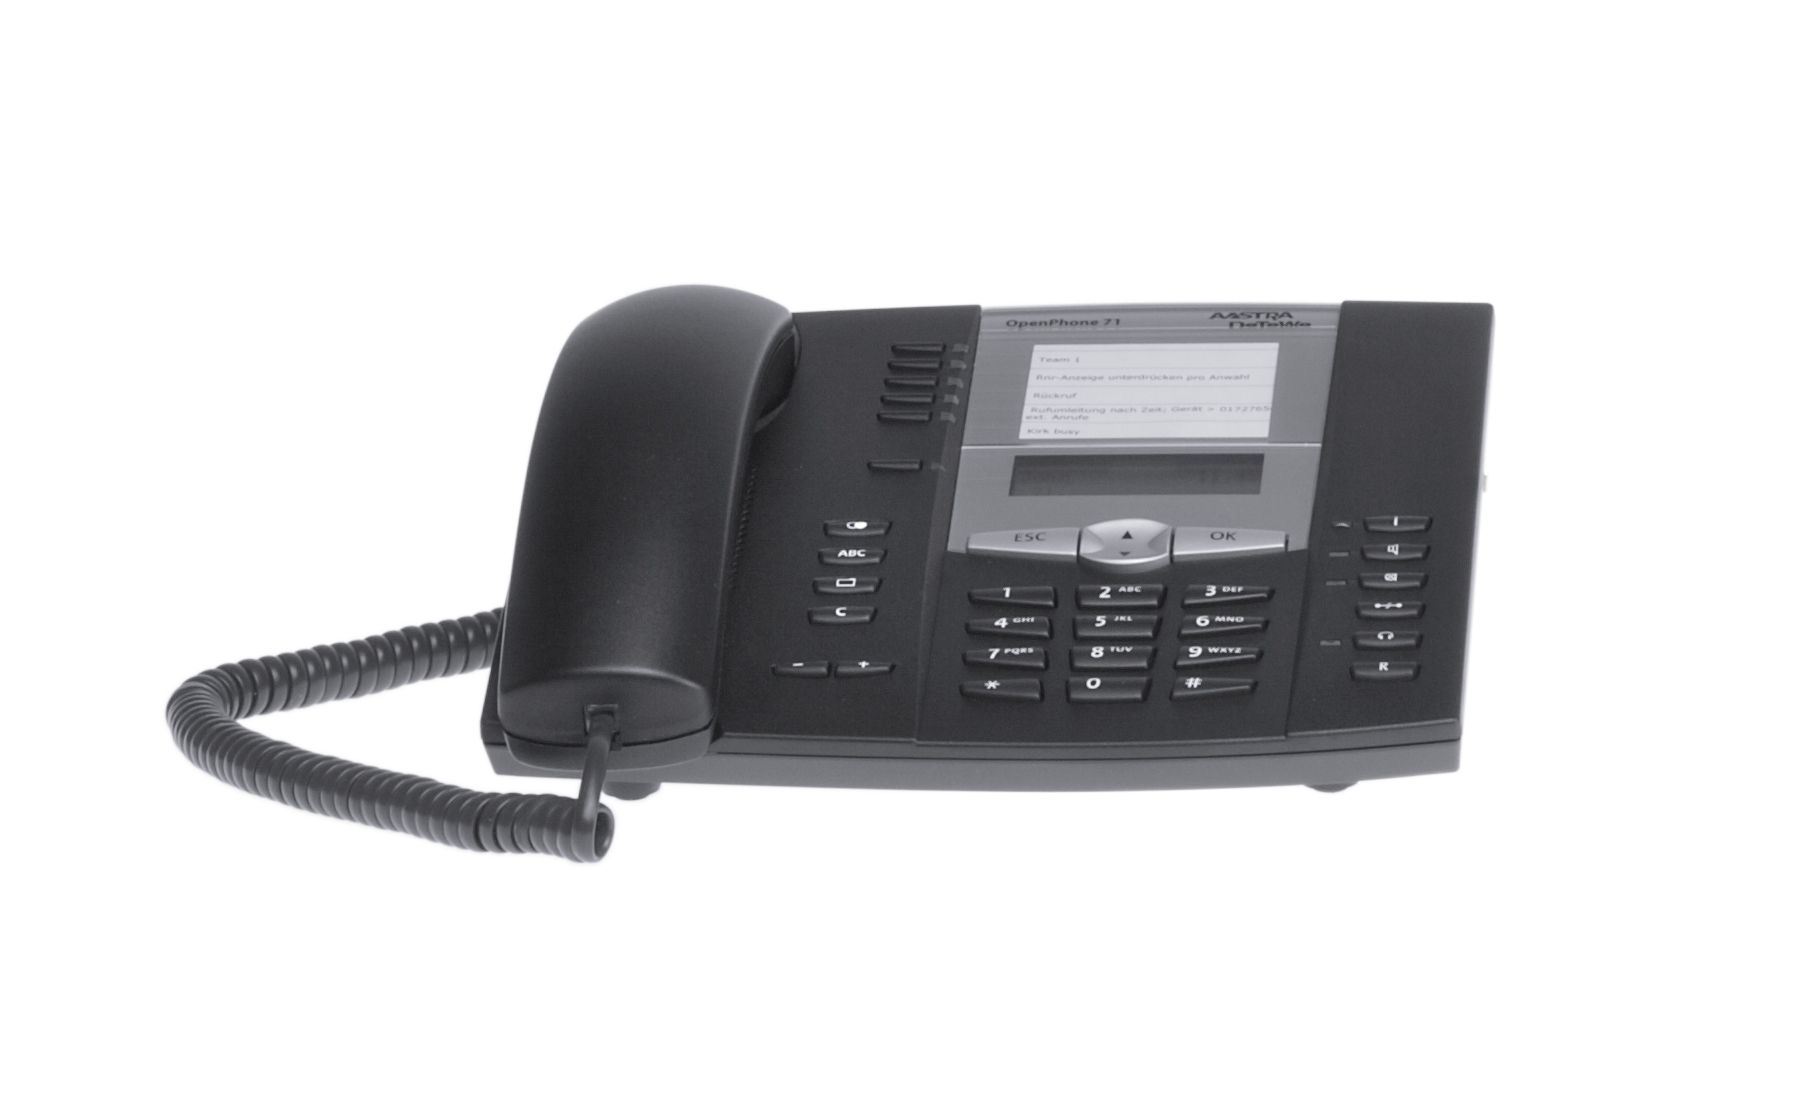 Aastra DeTeWe OpenPhone 6771 1000 OpenPhone 71 Telefon für OpenCom 100